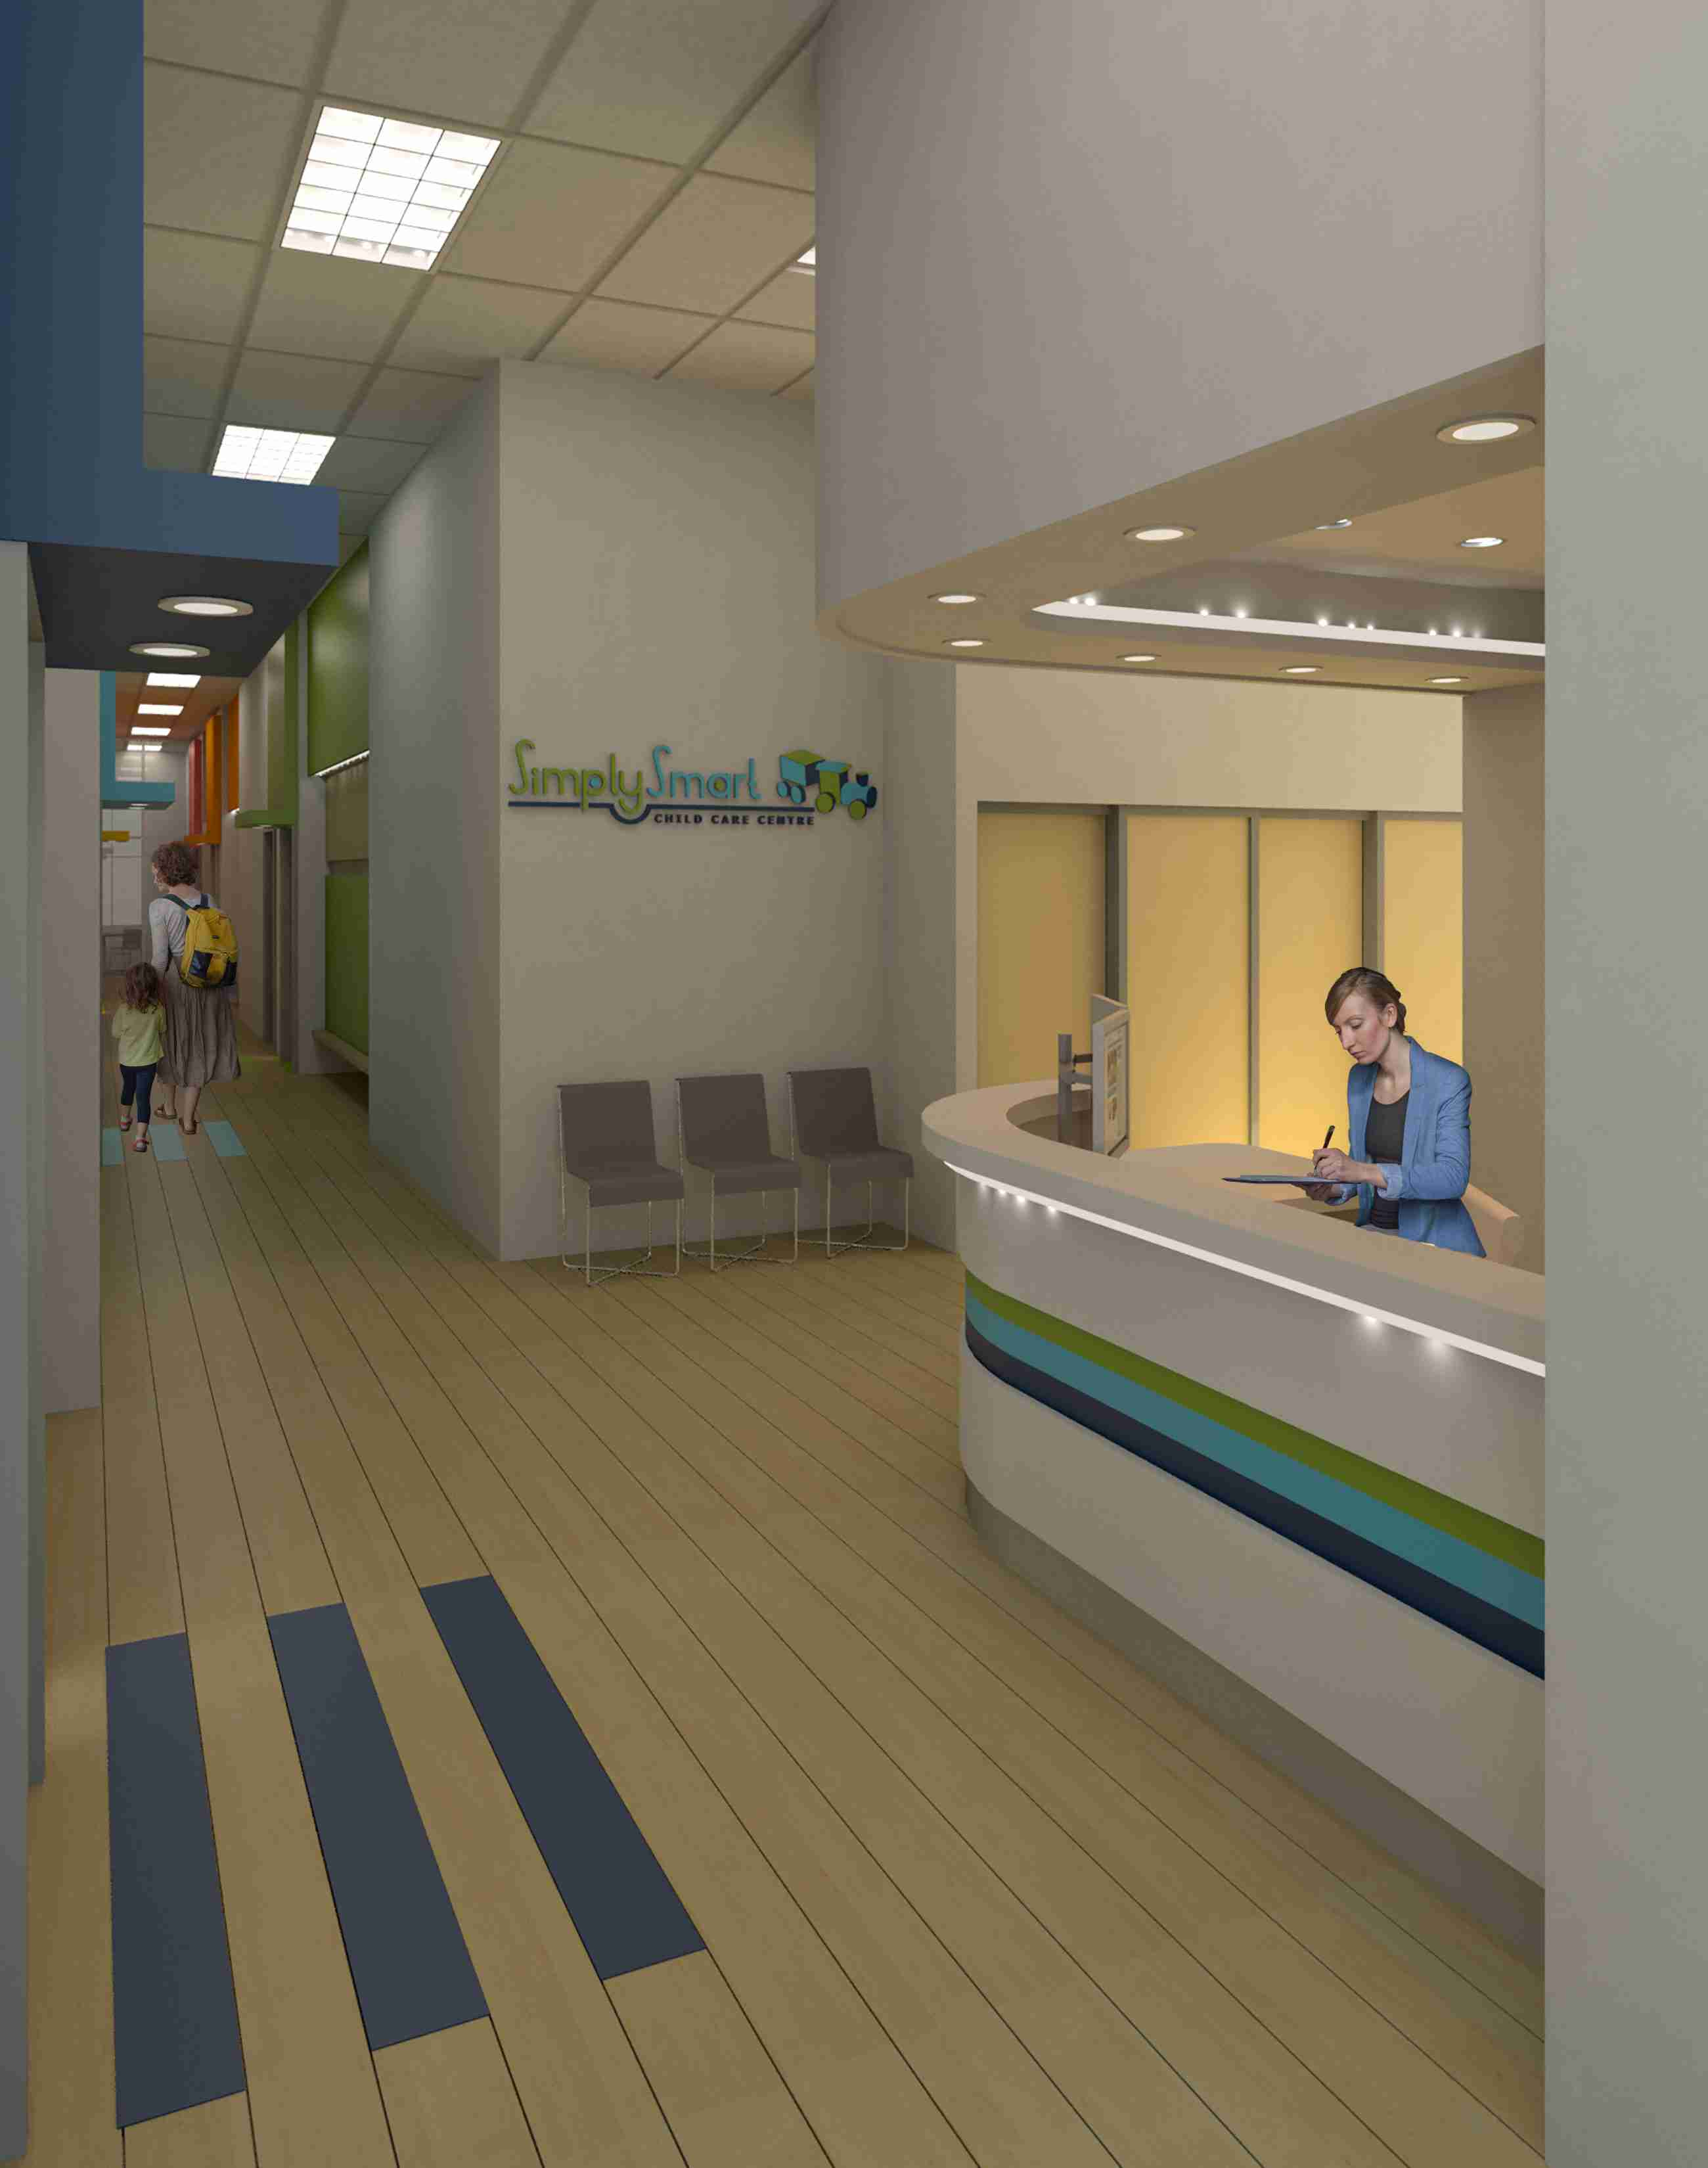 Entrance area of SimplySmart Child Care Centre showing reception area